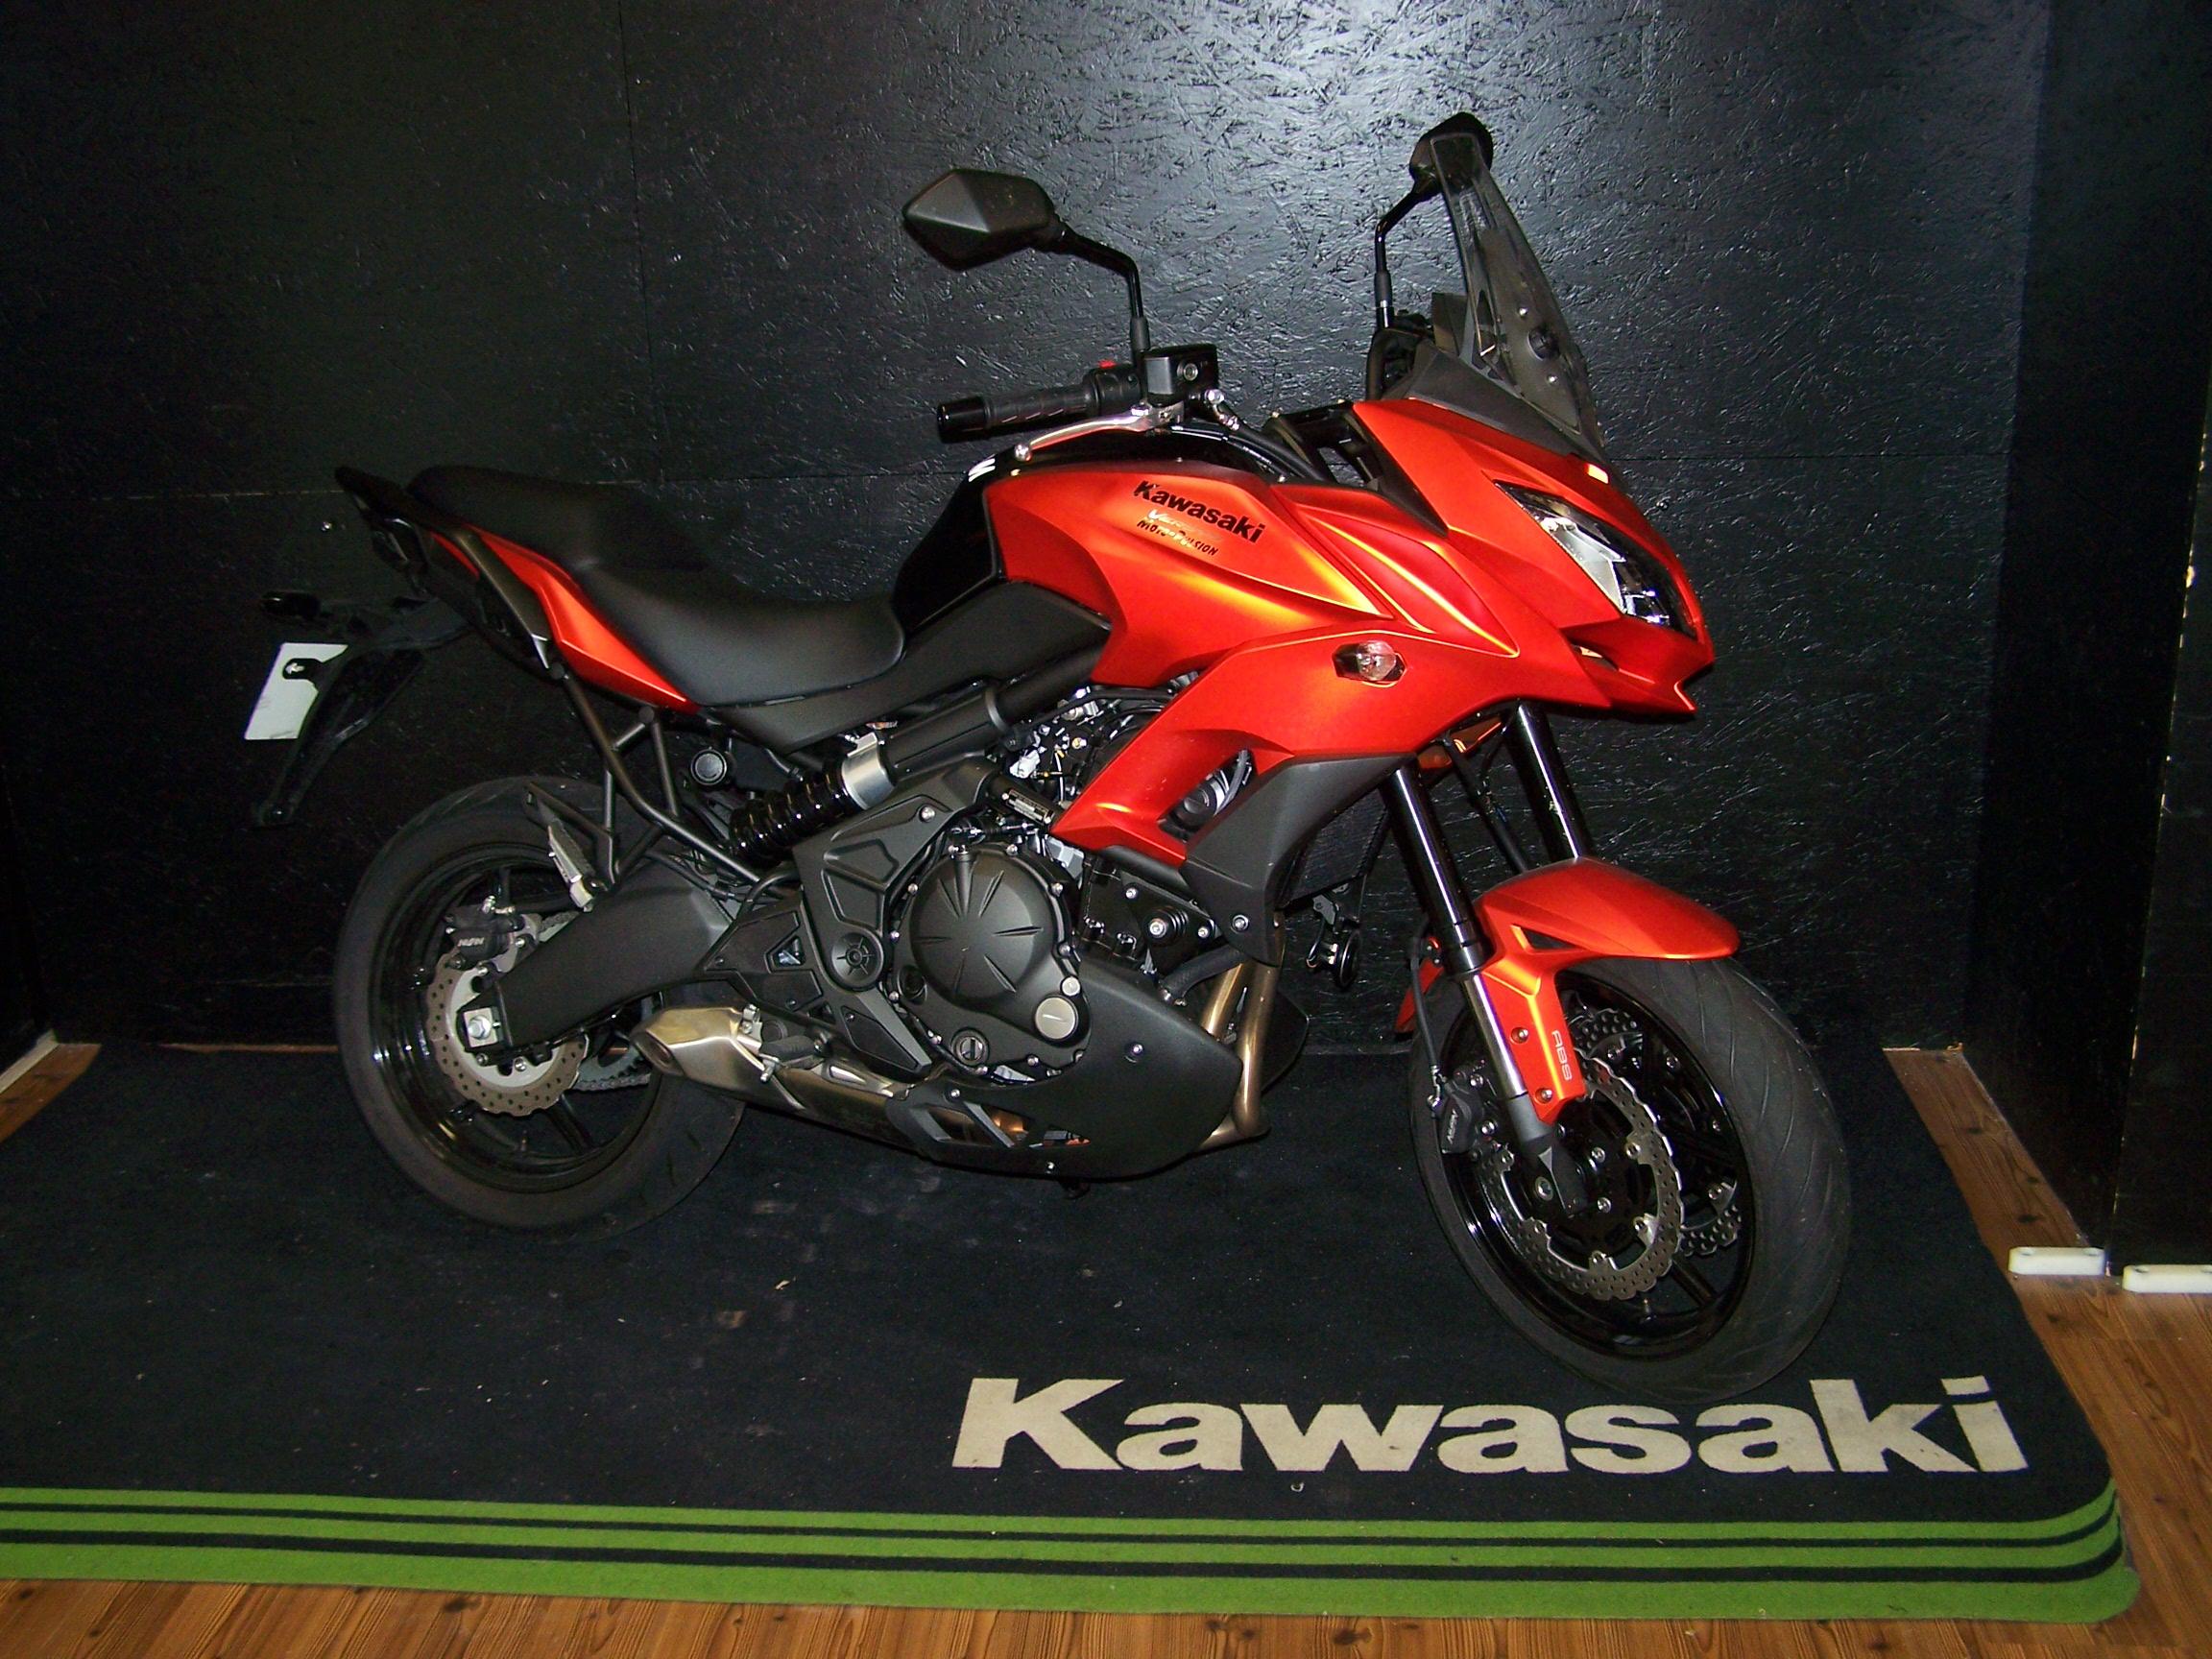 kawasaki versys 650 abs trail occasion moto pulsion concessionnaire moto exclusif kawasaki. Black Bedroom Furniture Sets. Home Design Ideas